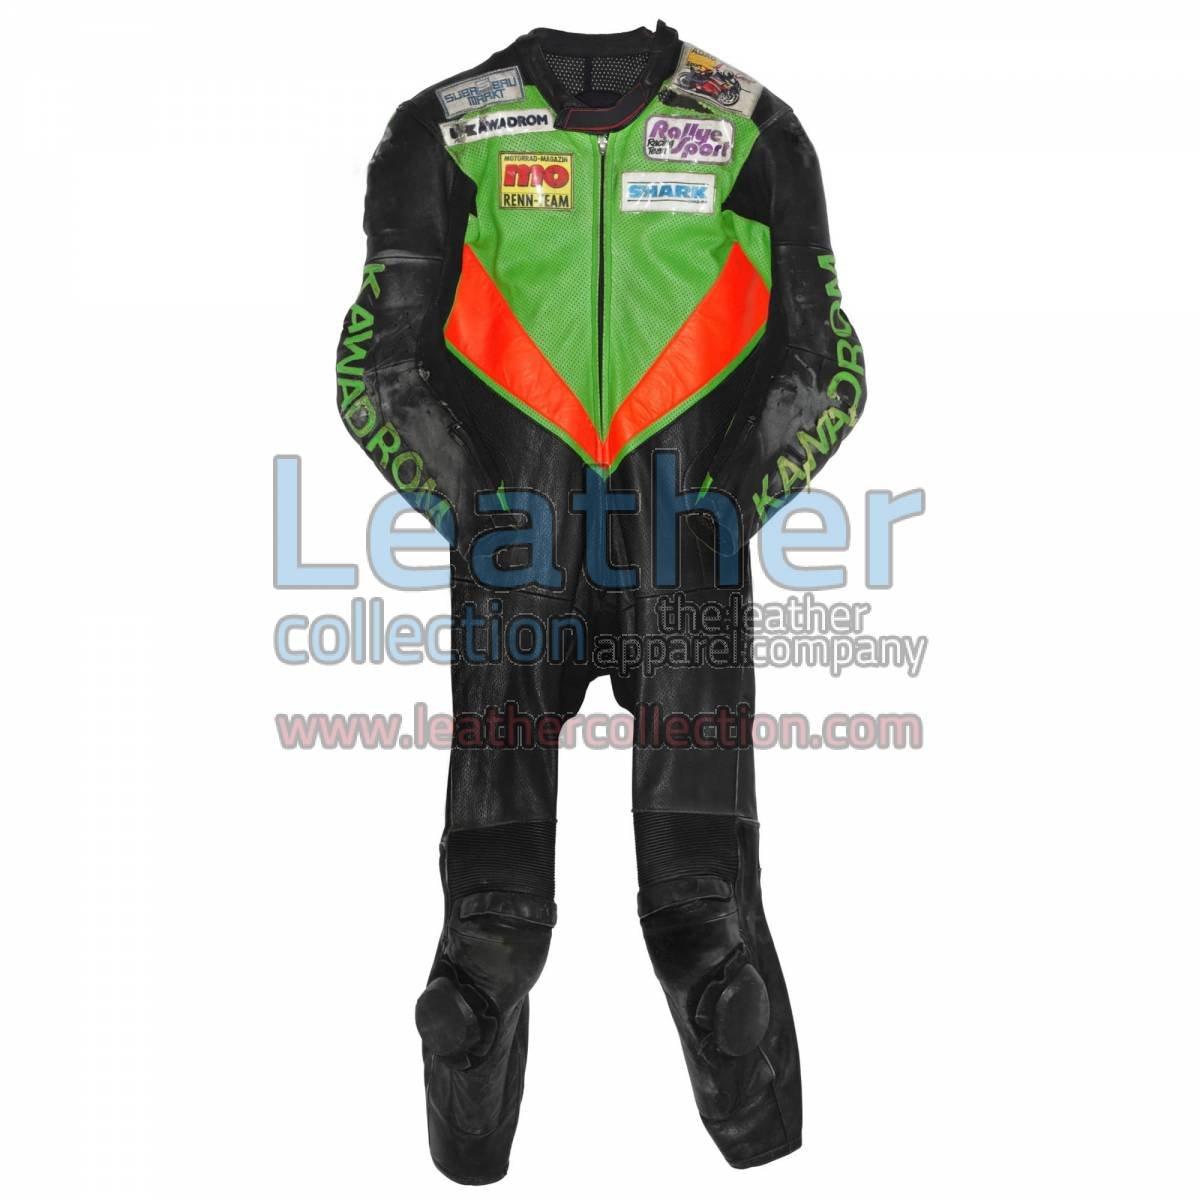 Christian Treutlein IDM 1997 Motorcycle Suit